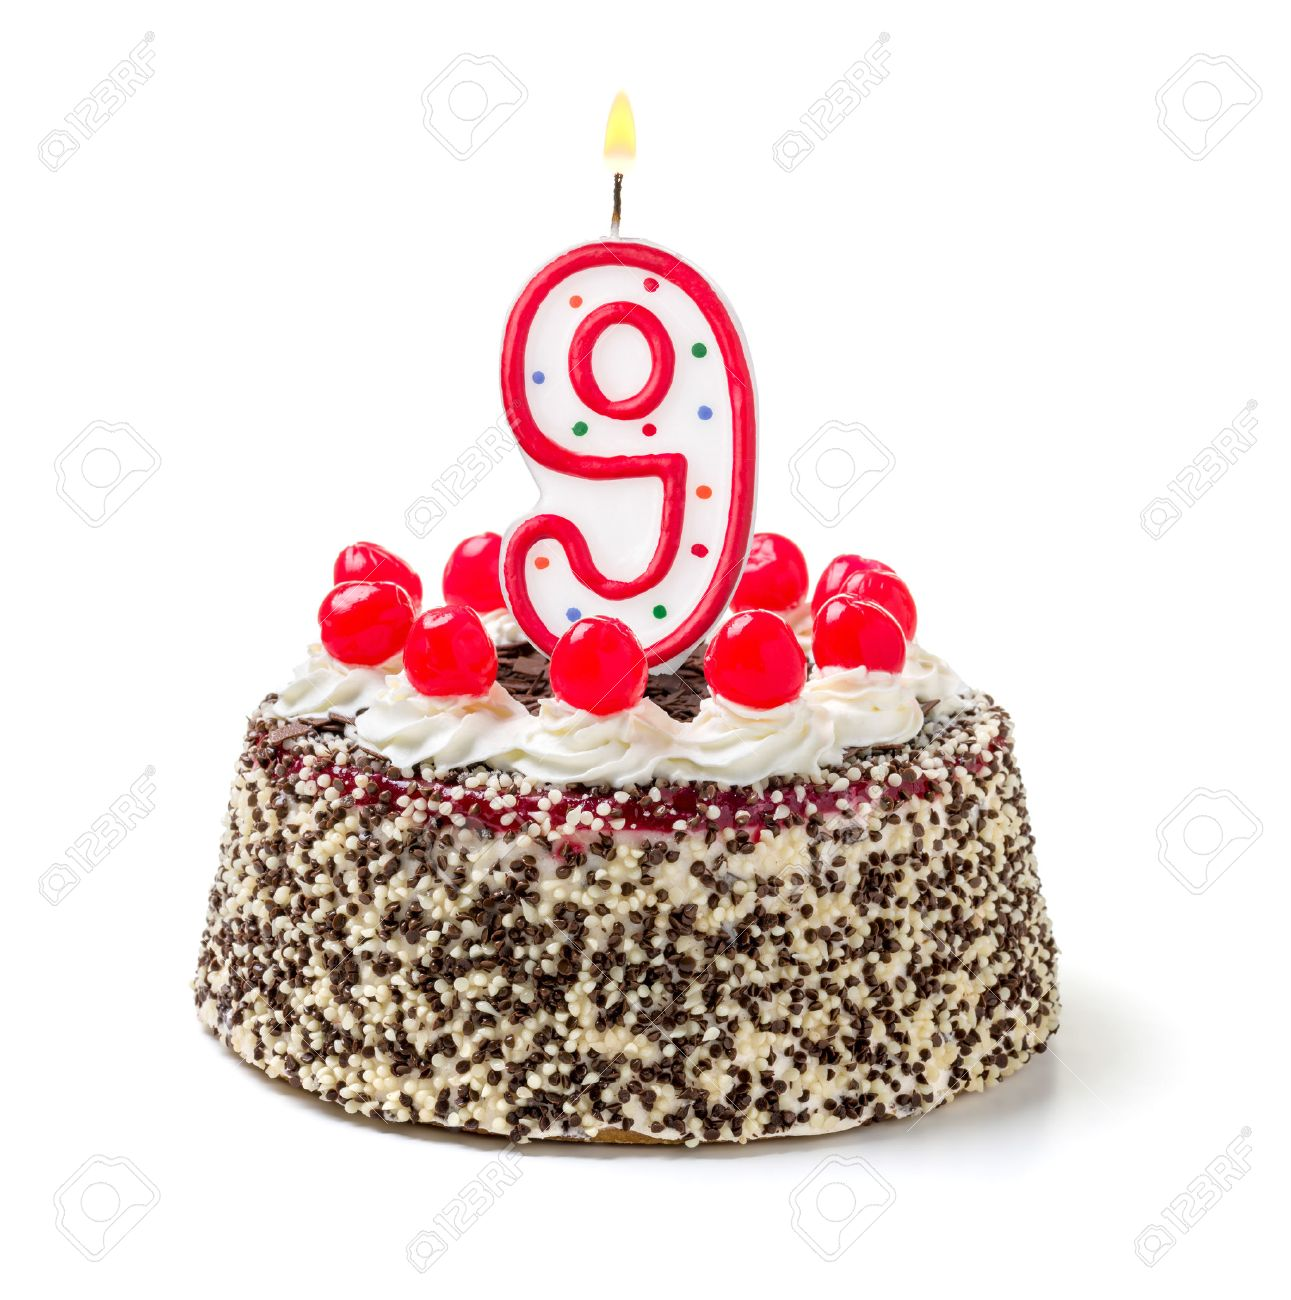 Birthday Cake With Burning Candle Number 9 Stock Photo